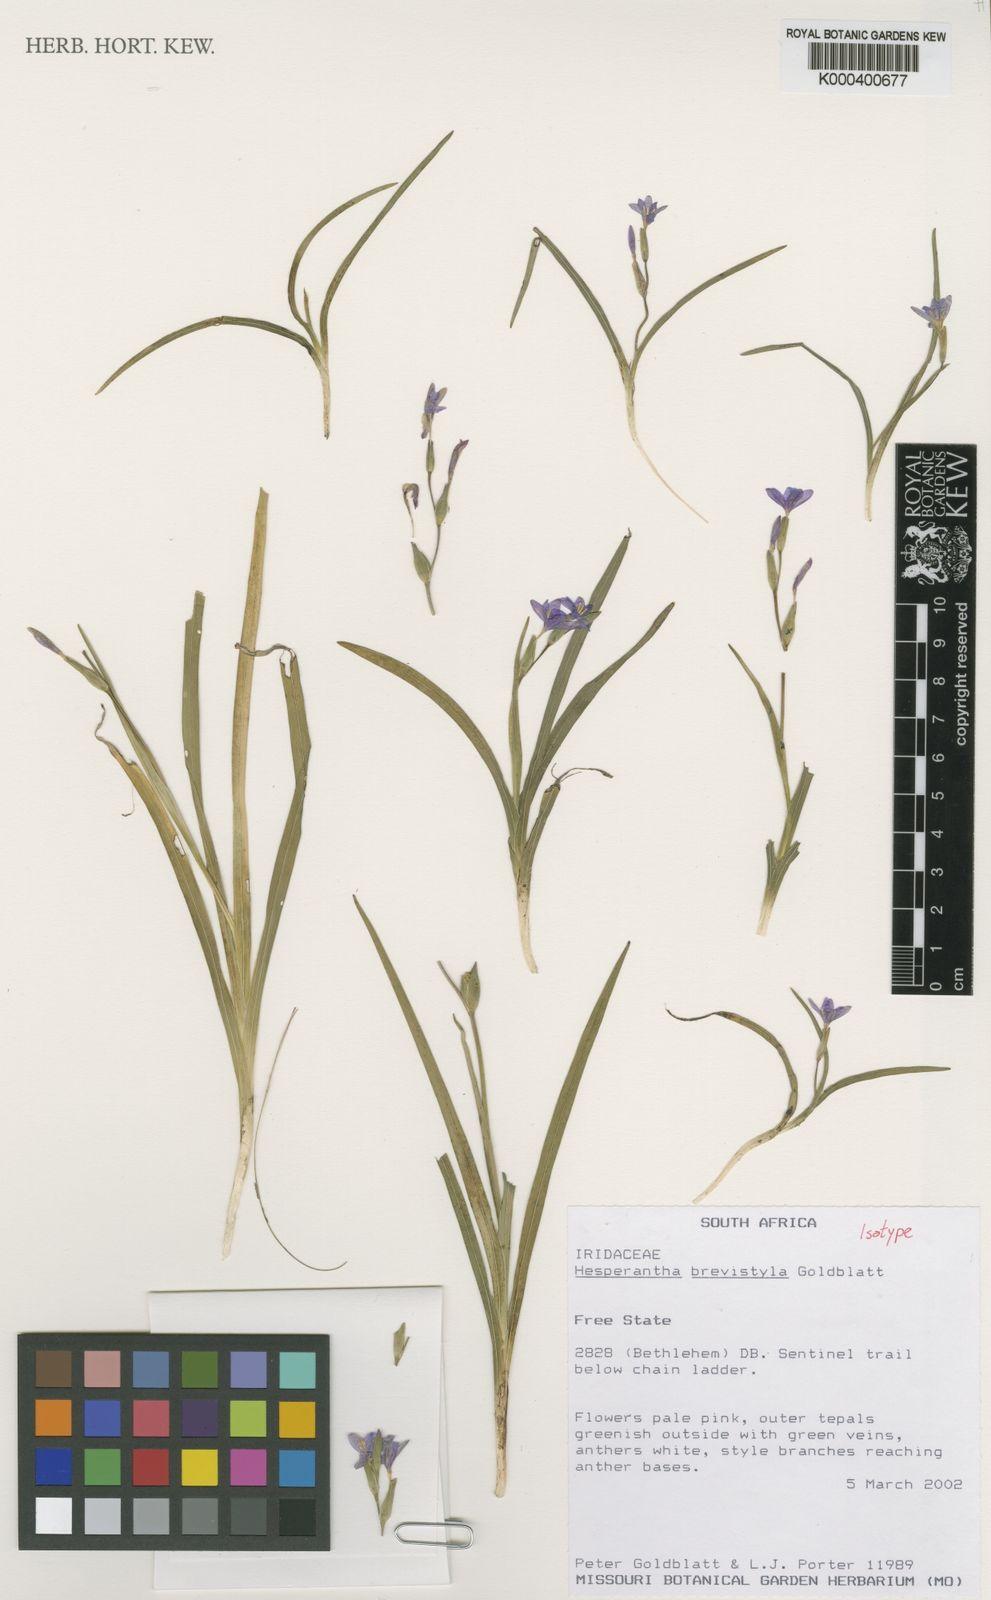 Anther Ladder hesperantha brevistyla goldblatt   plants of the world